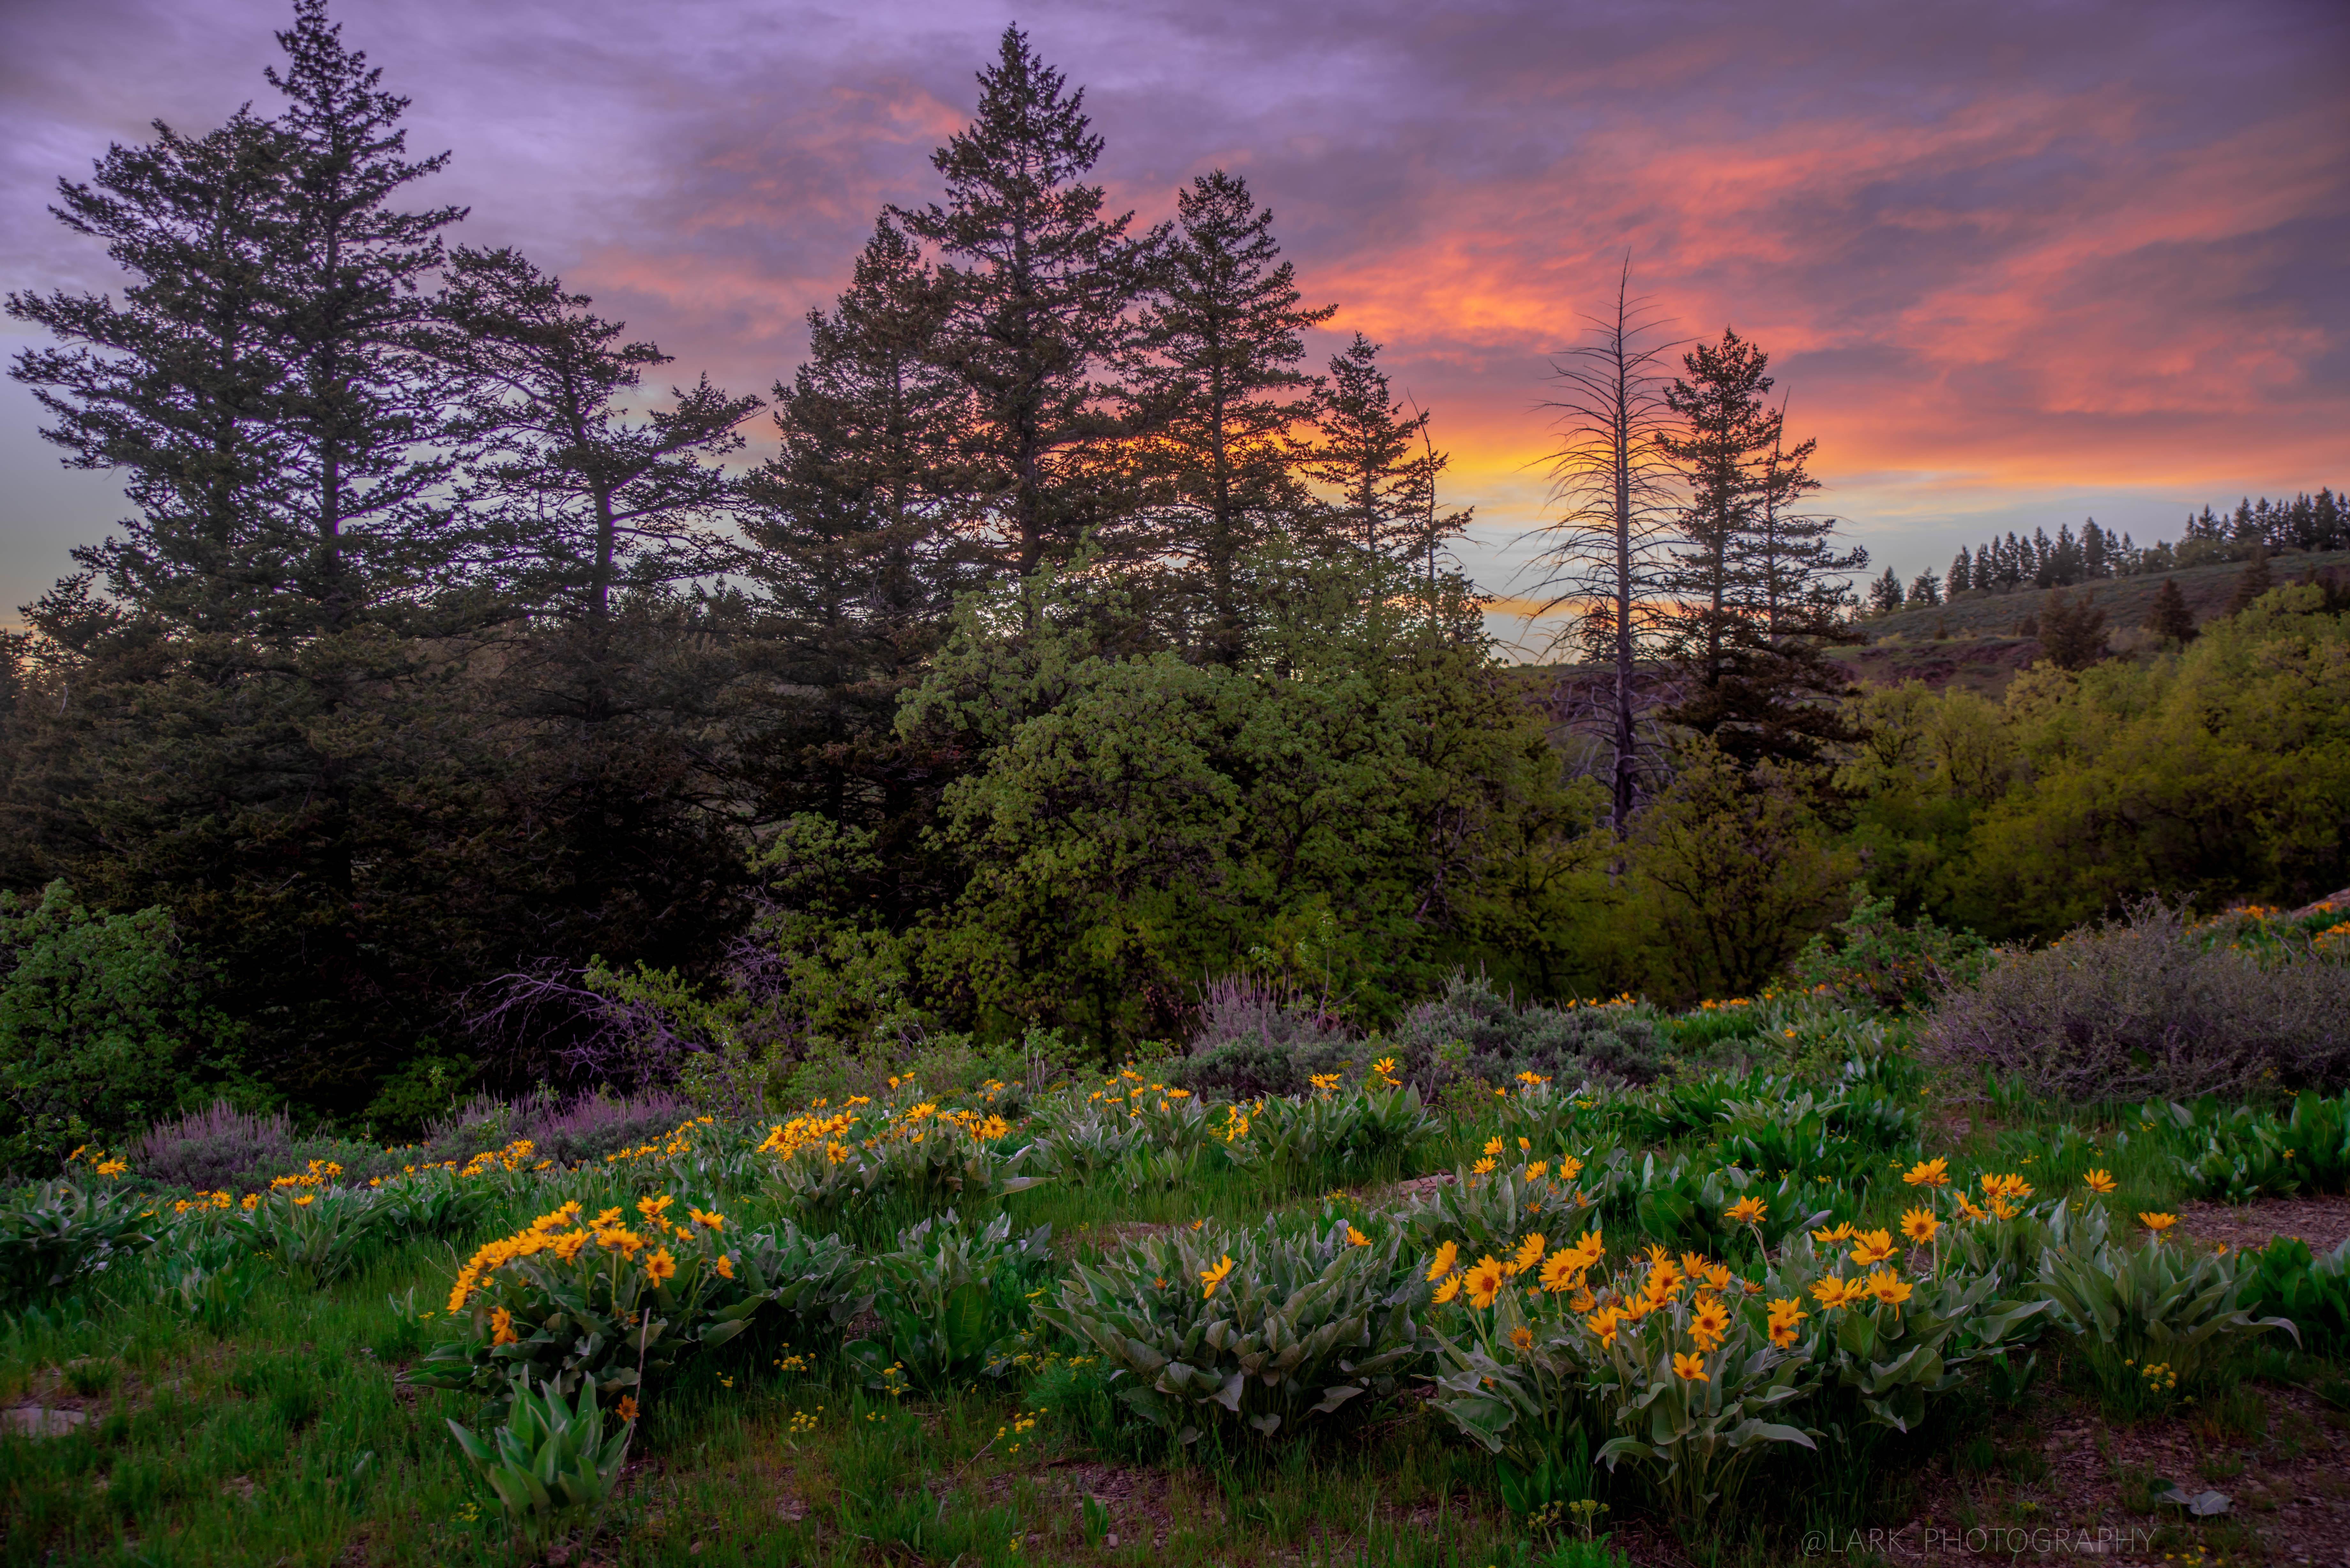 Colorful Springtime Sunset In Idaho Usa 7360 4912 Nature Photography Sunset Photos Landscape Photos